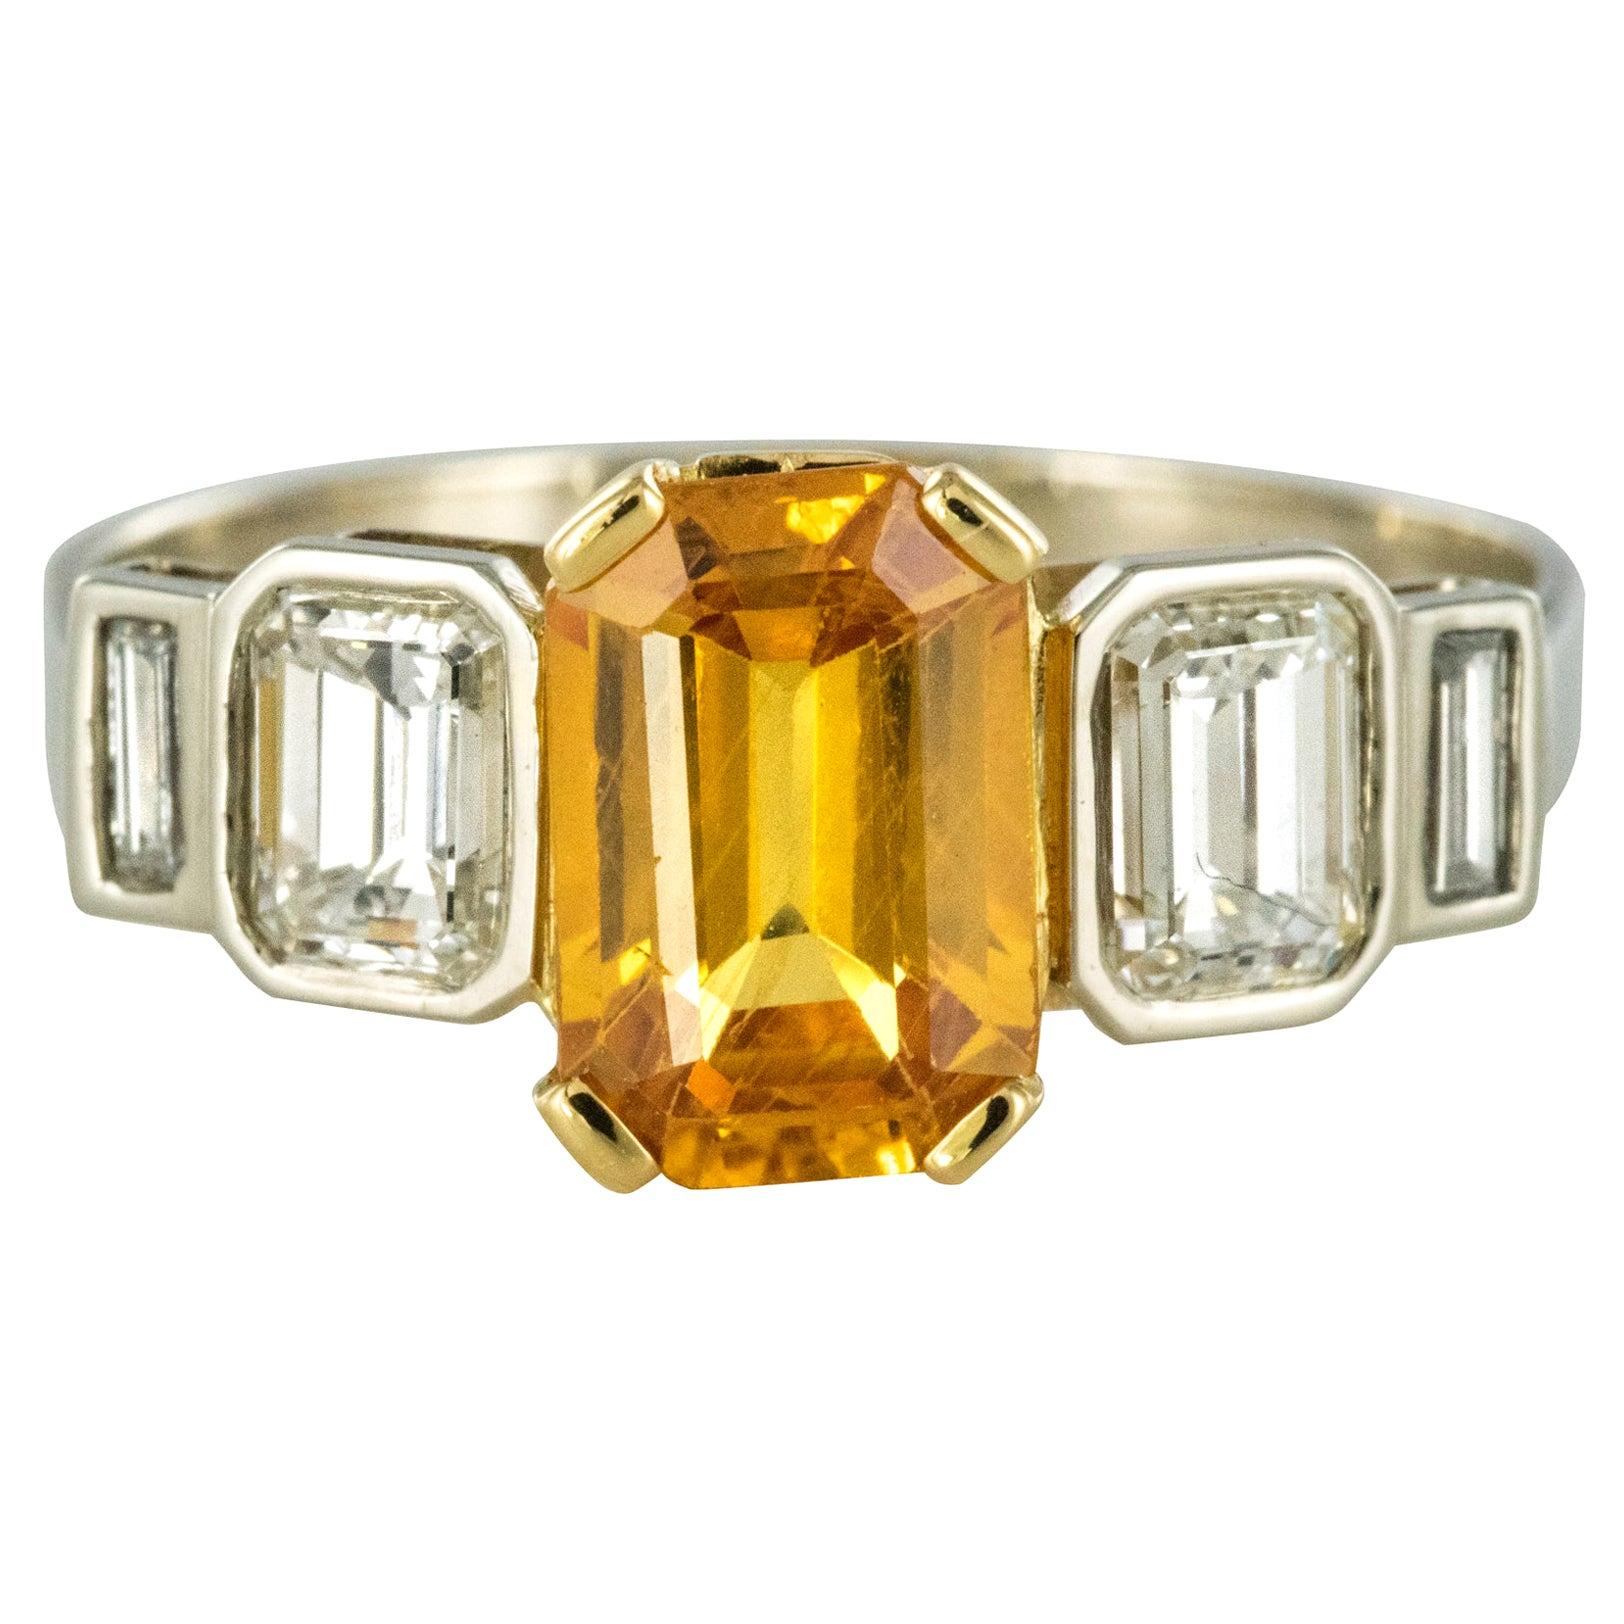 Art Deco Style Yellow Ceylon Sapphire Diamonds Ring